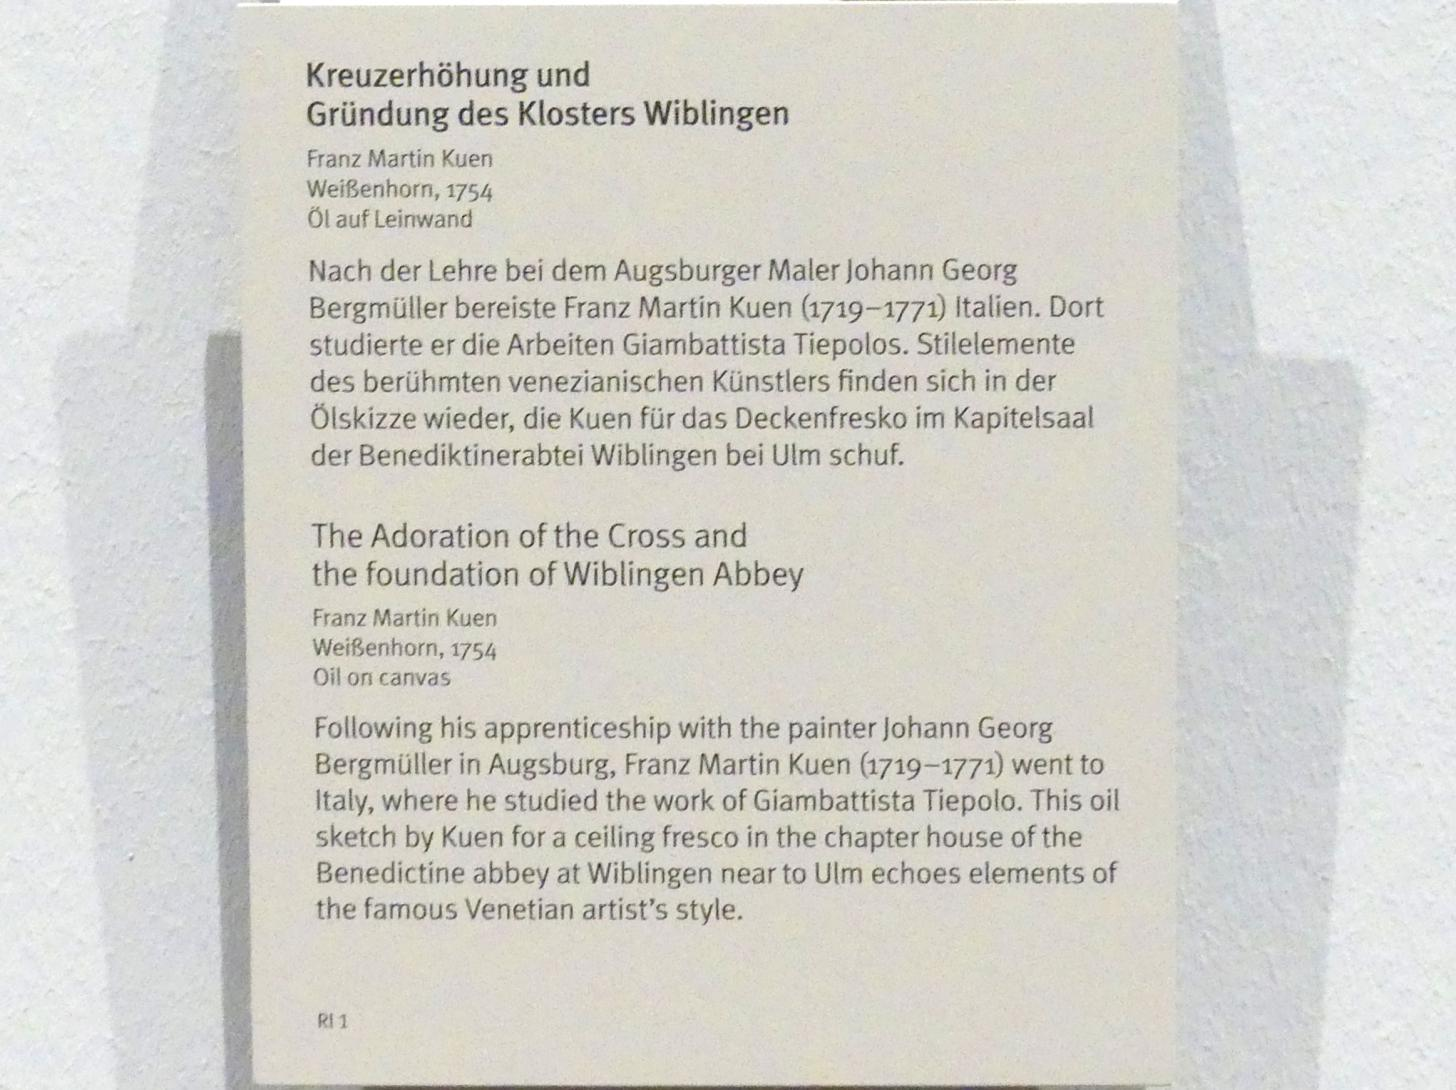 Franz Martin Kuen: Kreuzerhöhung und Gründung des Klosters Wiblingen, 1754